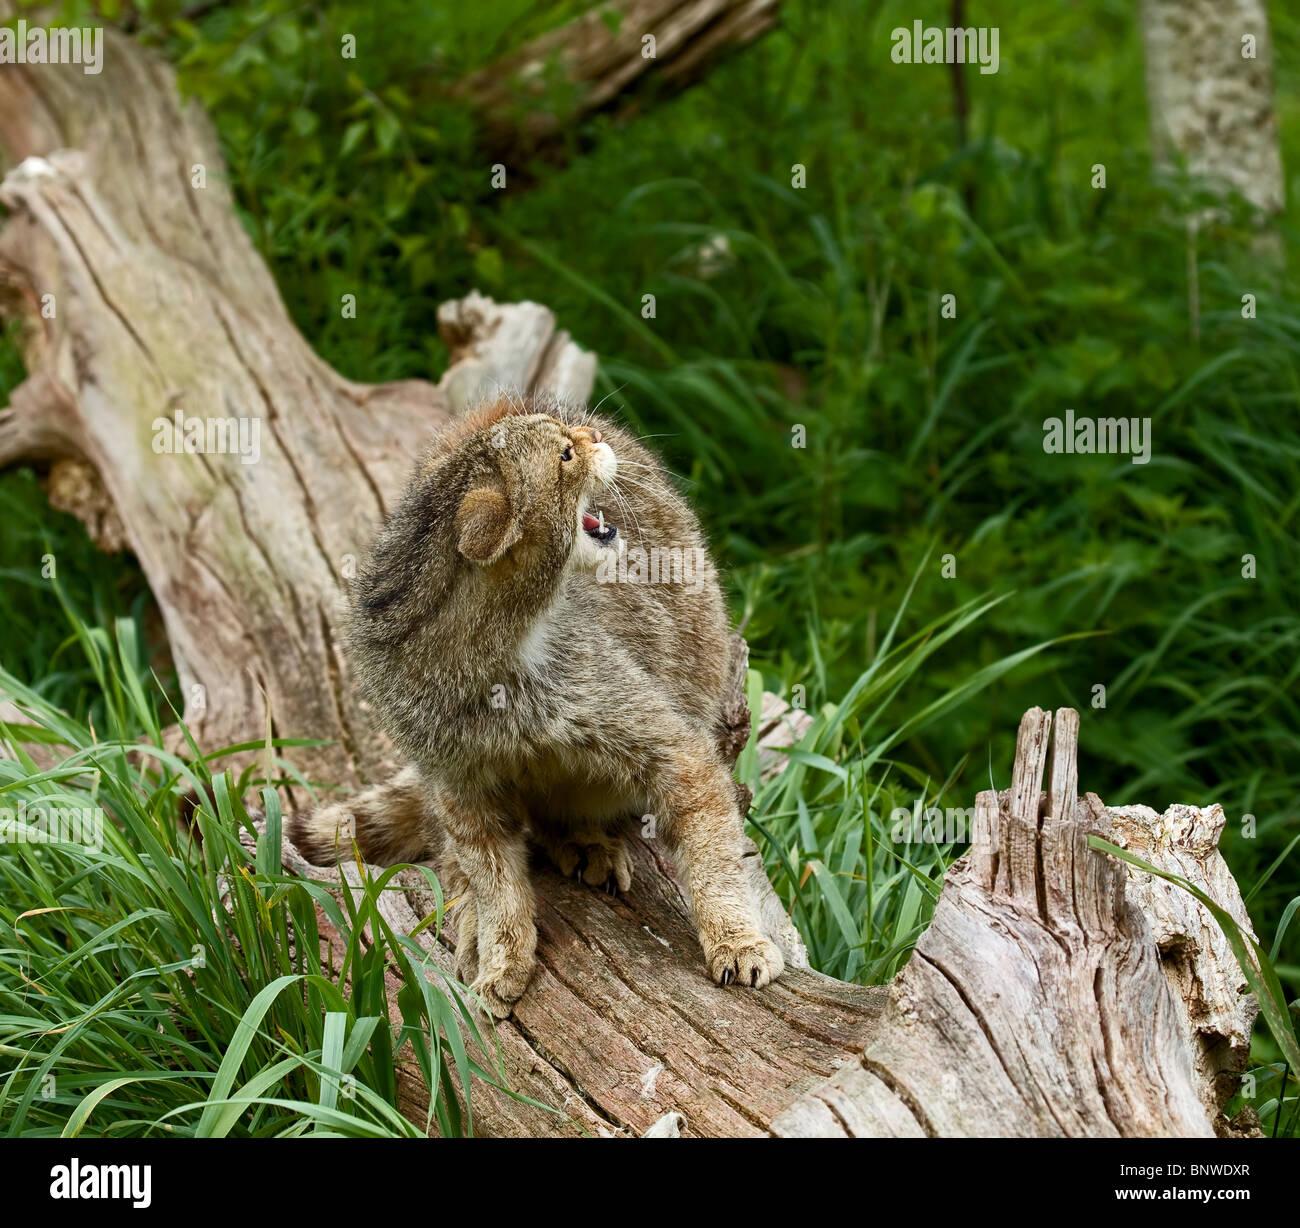 Scottish Wildcat snarling - Stock Image